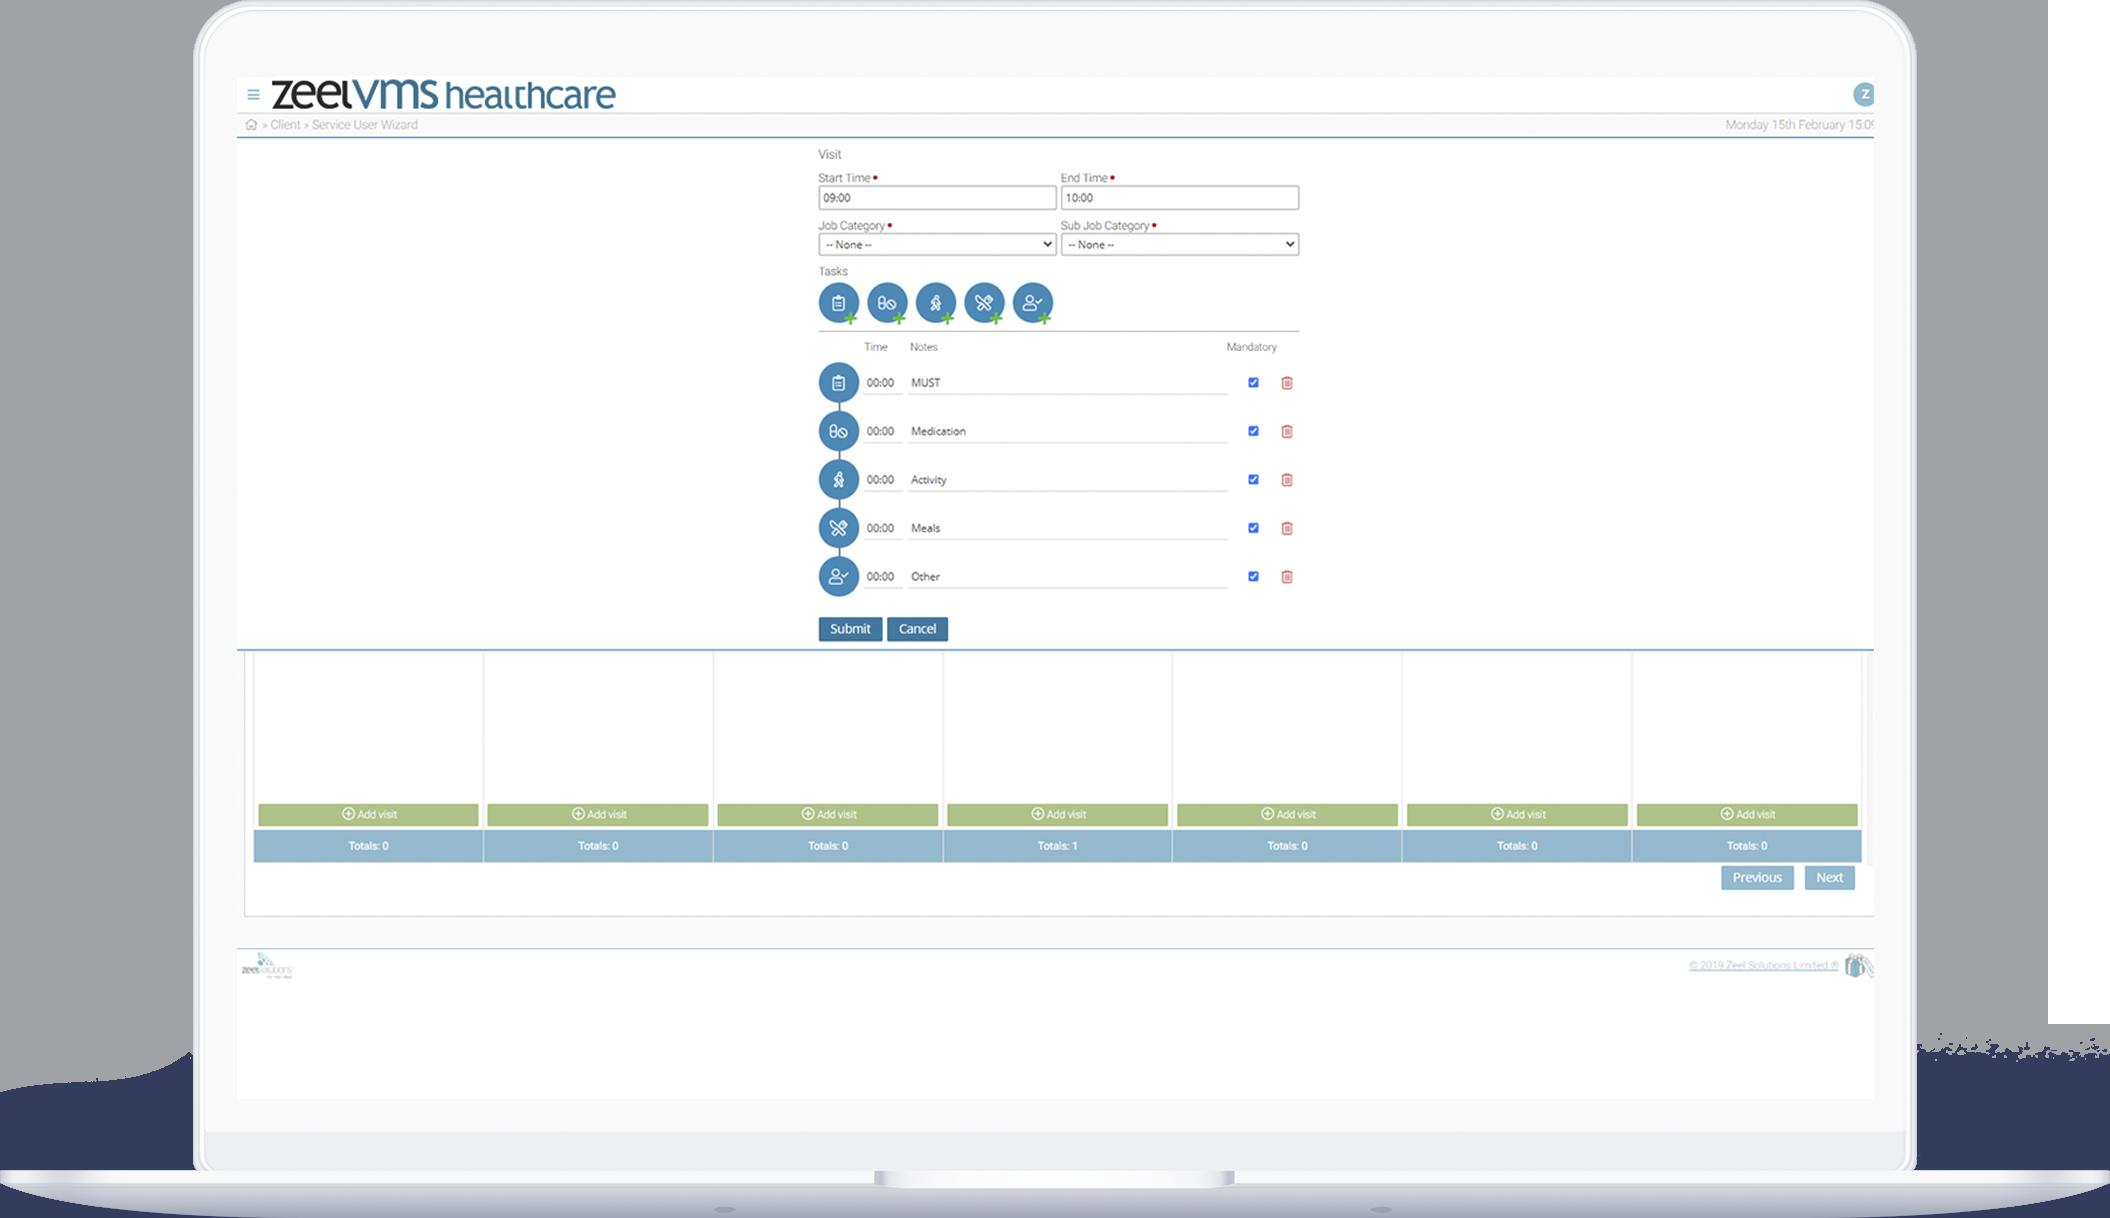 Zeel VMS healthcare tracking dashboard